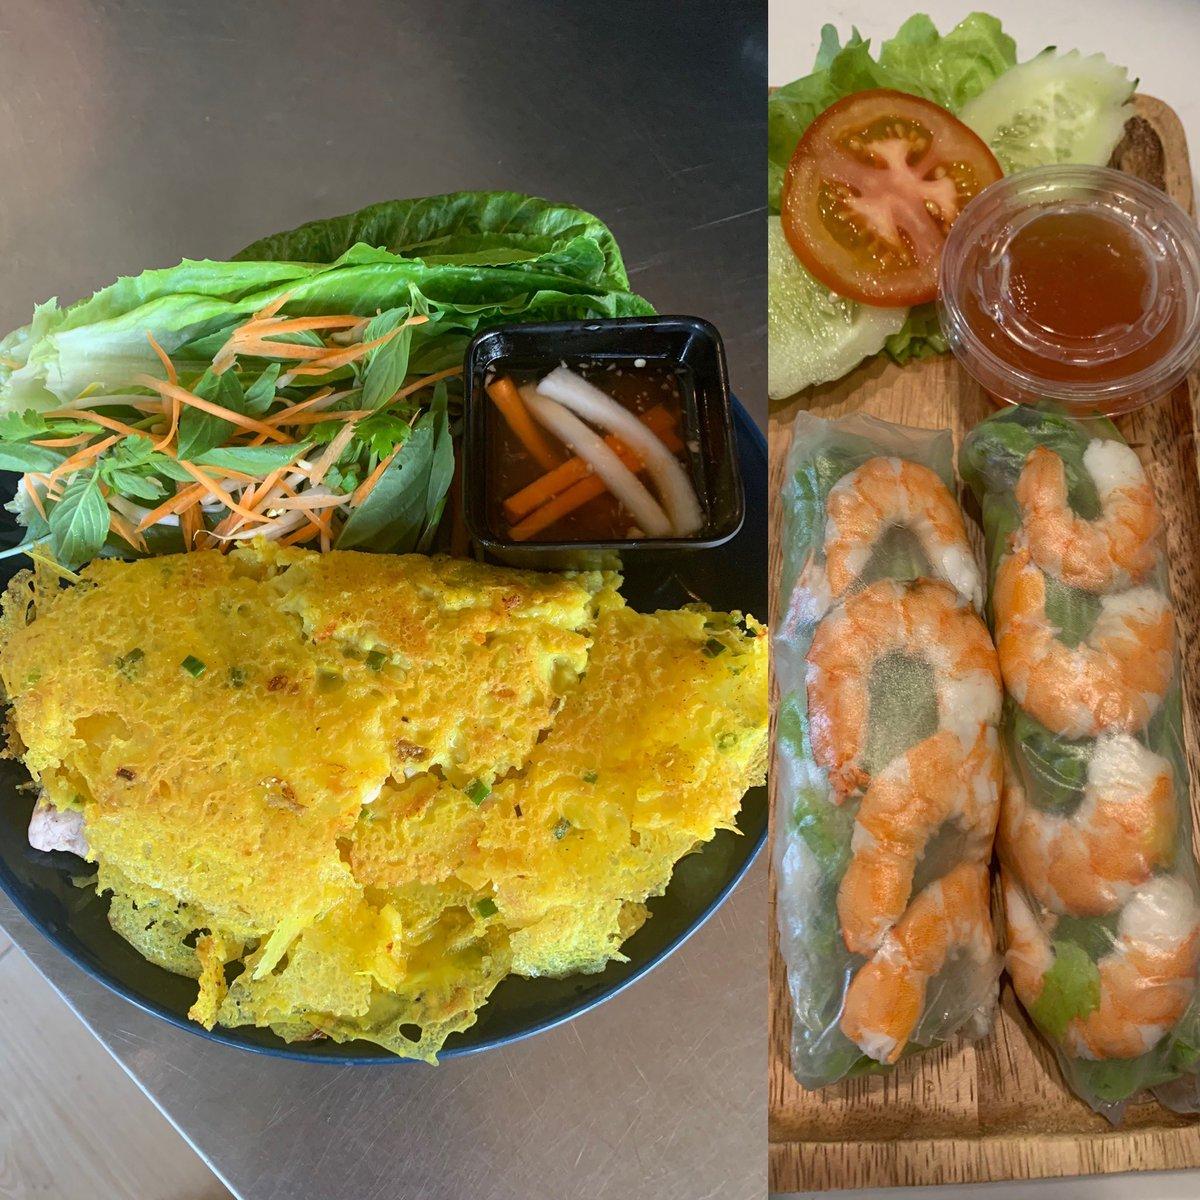 #banhxeo #vietnamesefood #b #vietnam #foodie #nhx #vietnamesecrepe #food #o #homecooking #vietfood #foodporn #banhmi #vietnamesecuisine #vietnamese #i #asianfood #foodphotography #foodstagram #banhtrangnuong #foodblogger #anuong #ng #yummy #homemade #banhgao #ngl #m #anvat #bhfyp https://t.co/TxqpGc712M